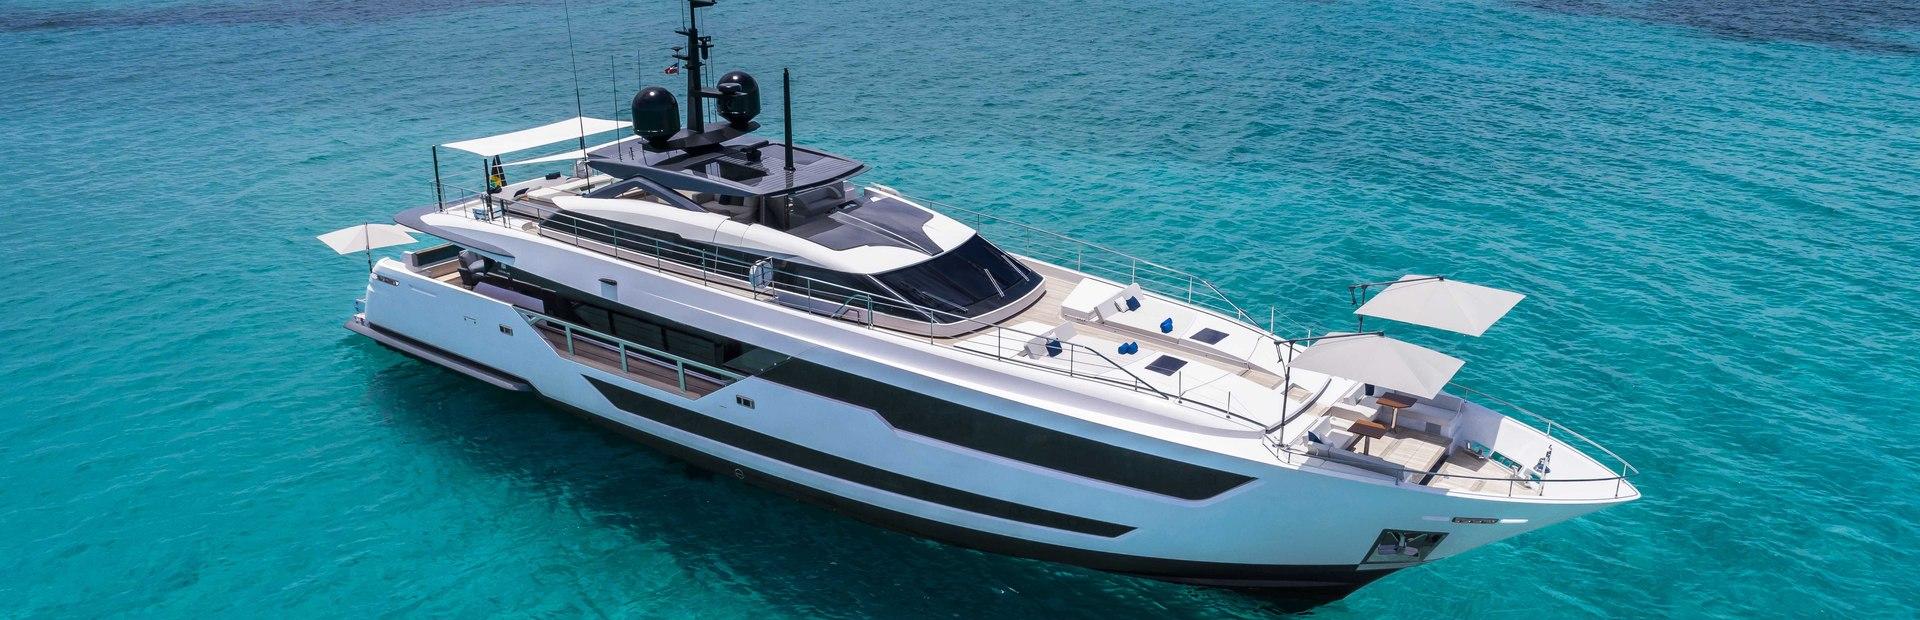 Custom Line 120 Yacht Charter